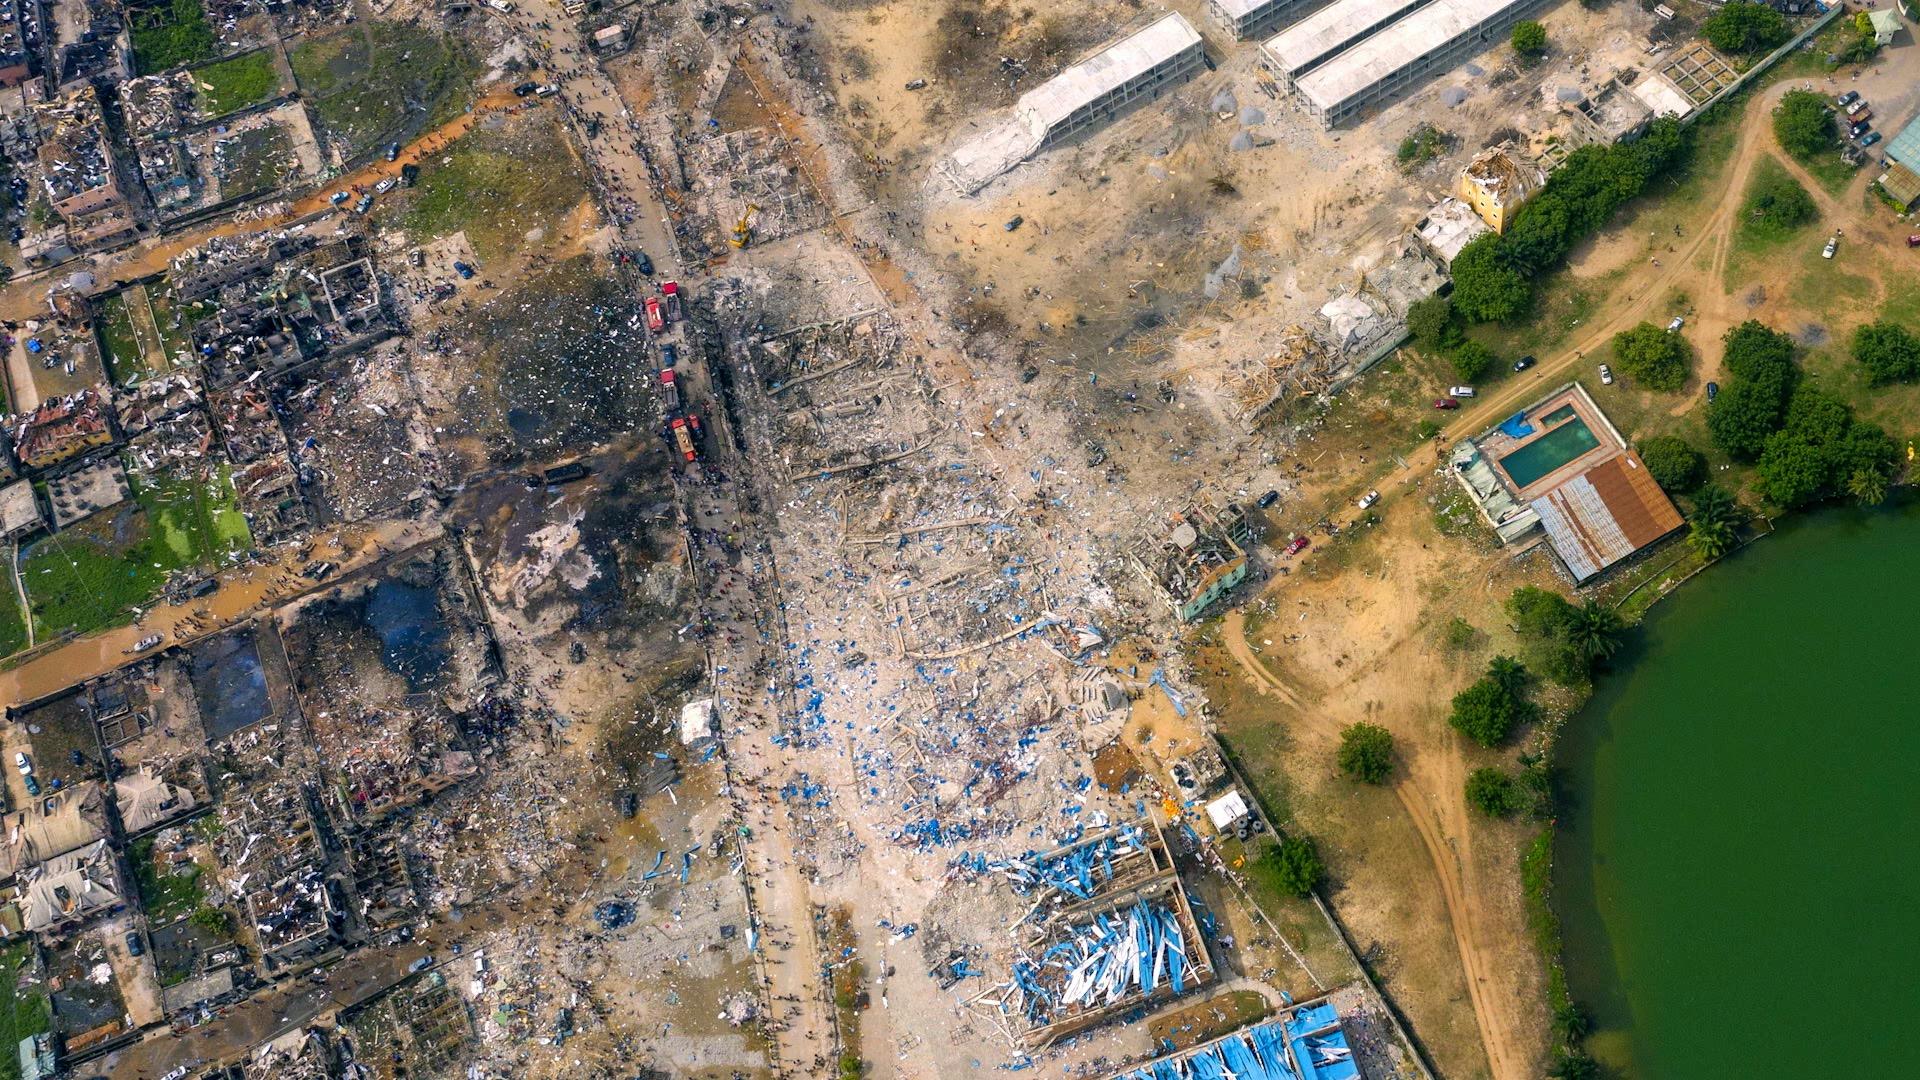 Africa eye-Drone shot of school